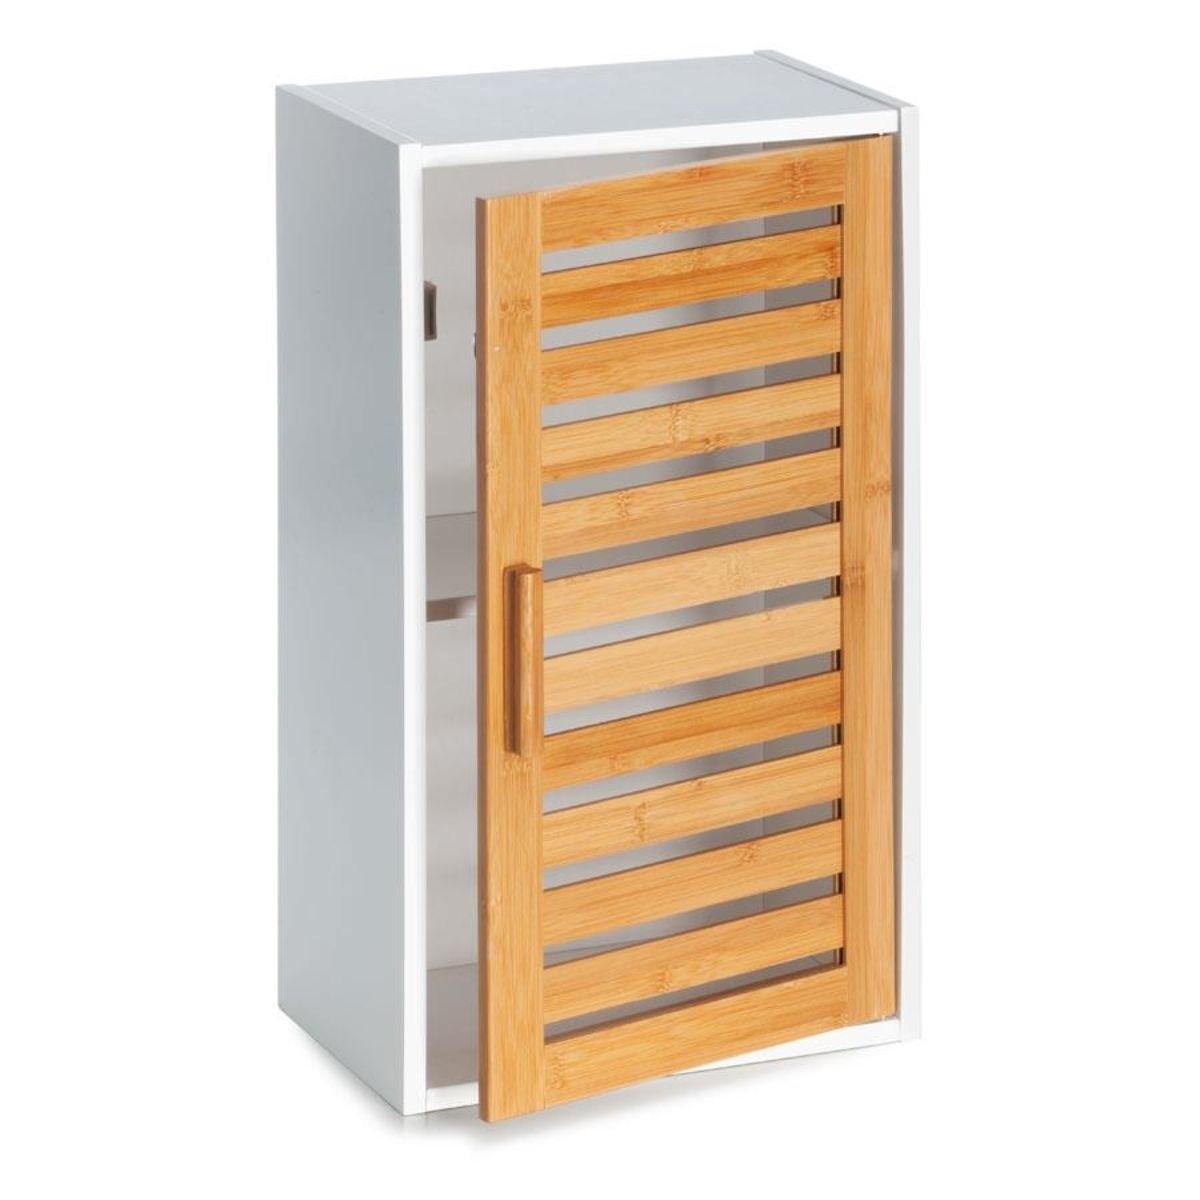 bamboo bathroom cabinet with adjustable shelf - Bathroom Cabinets Kmart